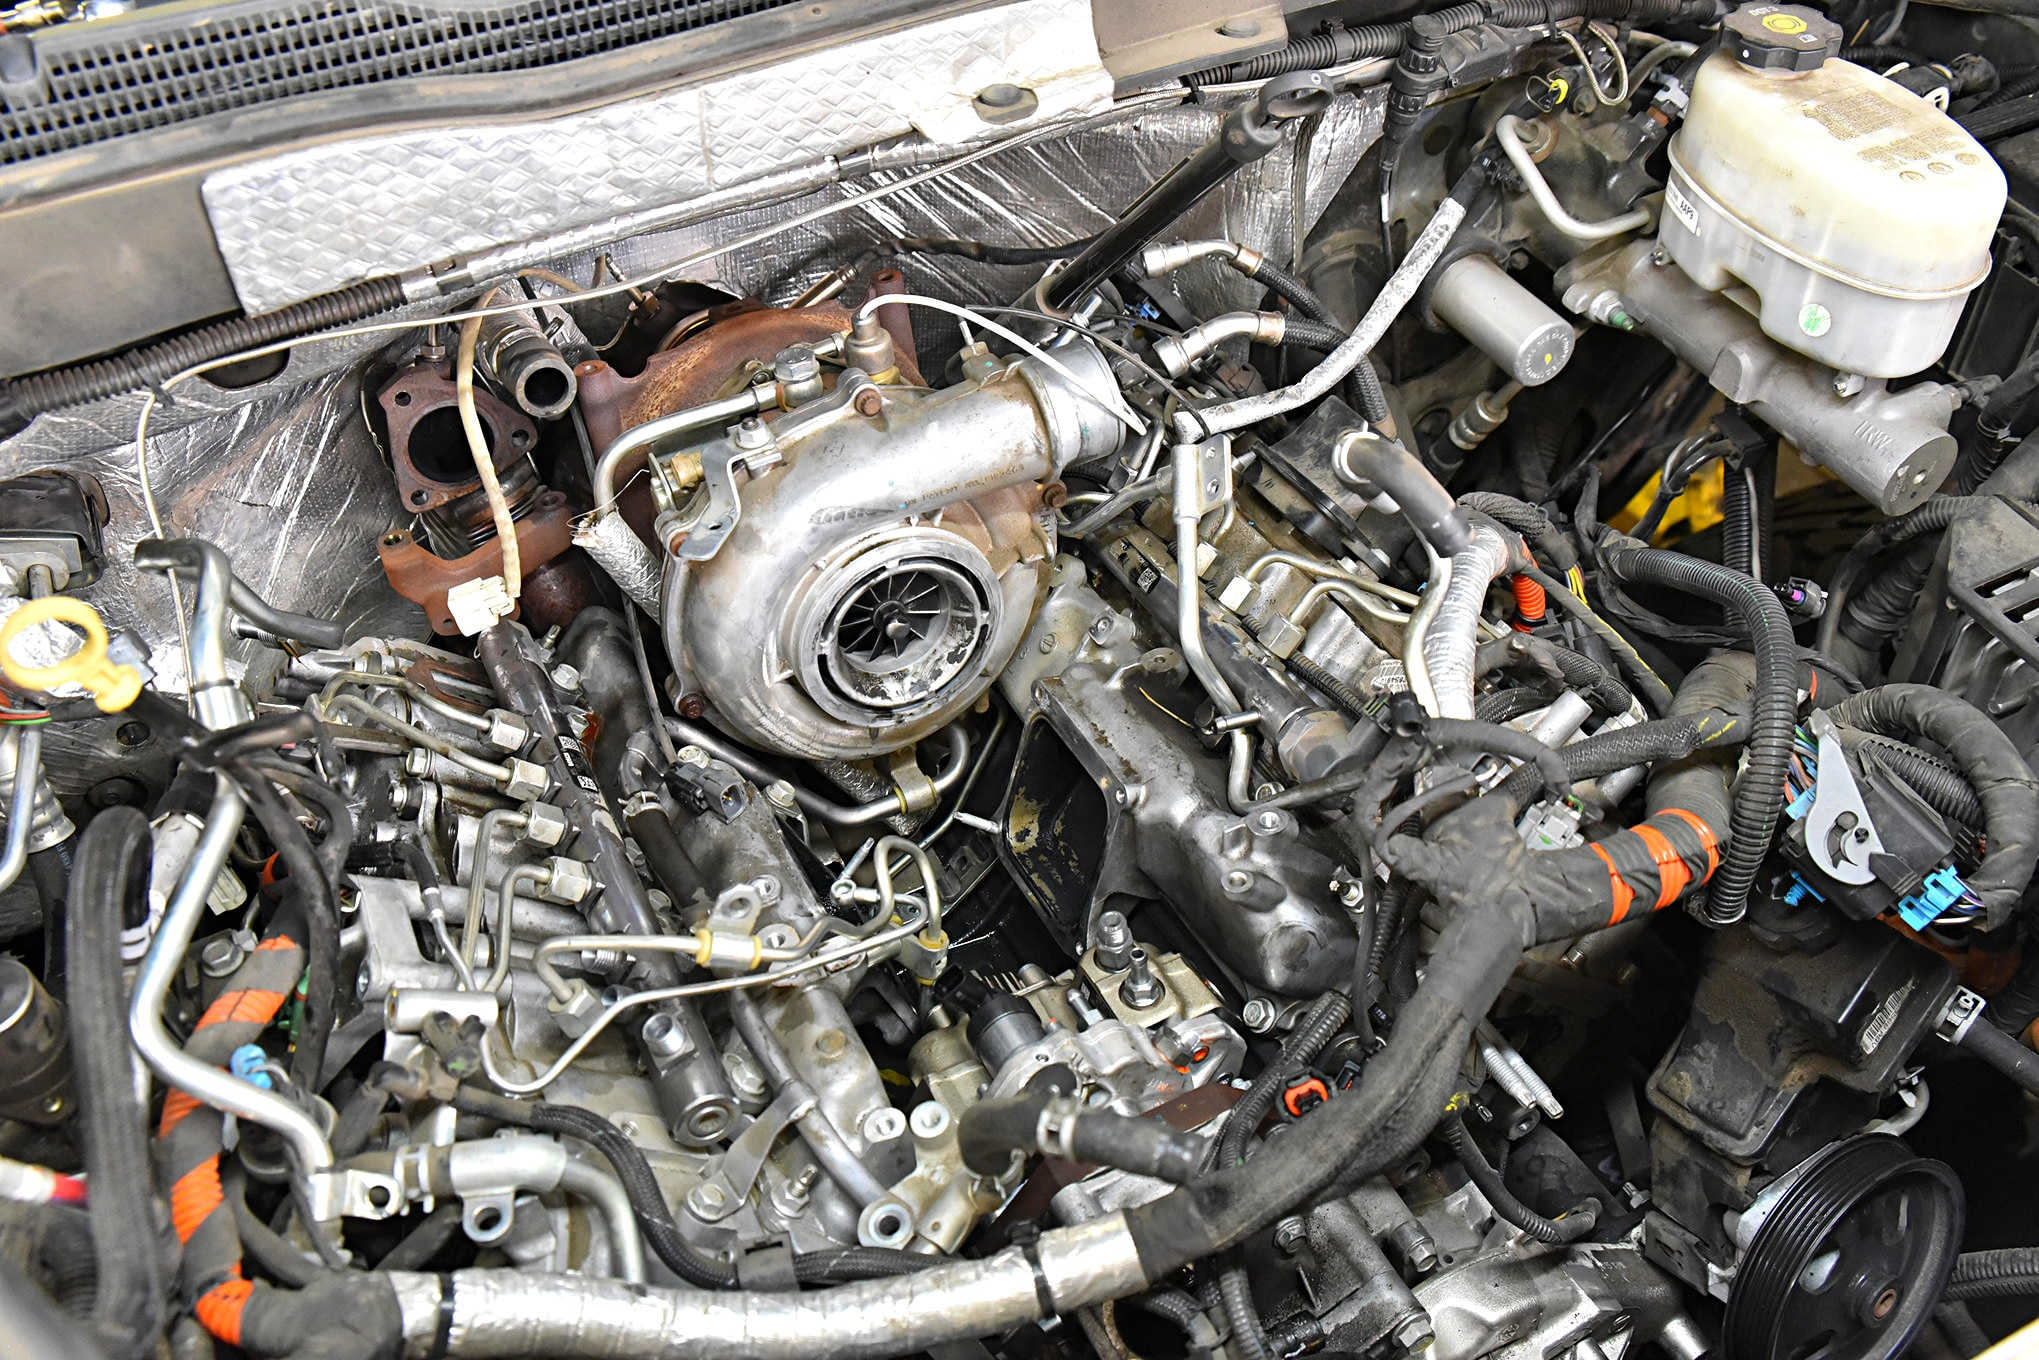 6.6L Duramax injector install installation return line kit Chevrolet Chevy 6.6L